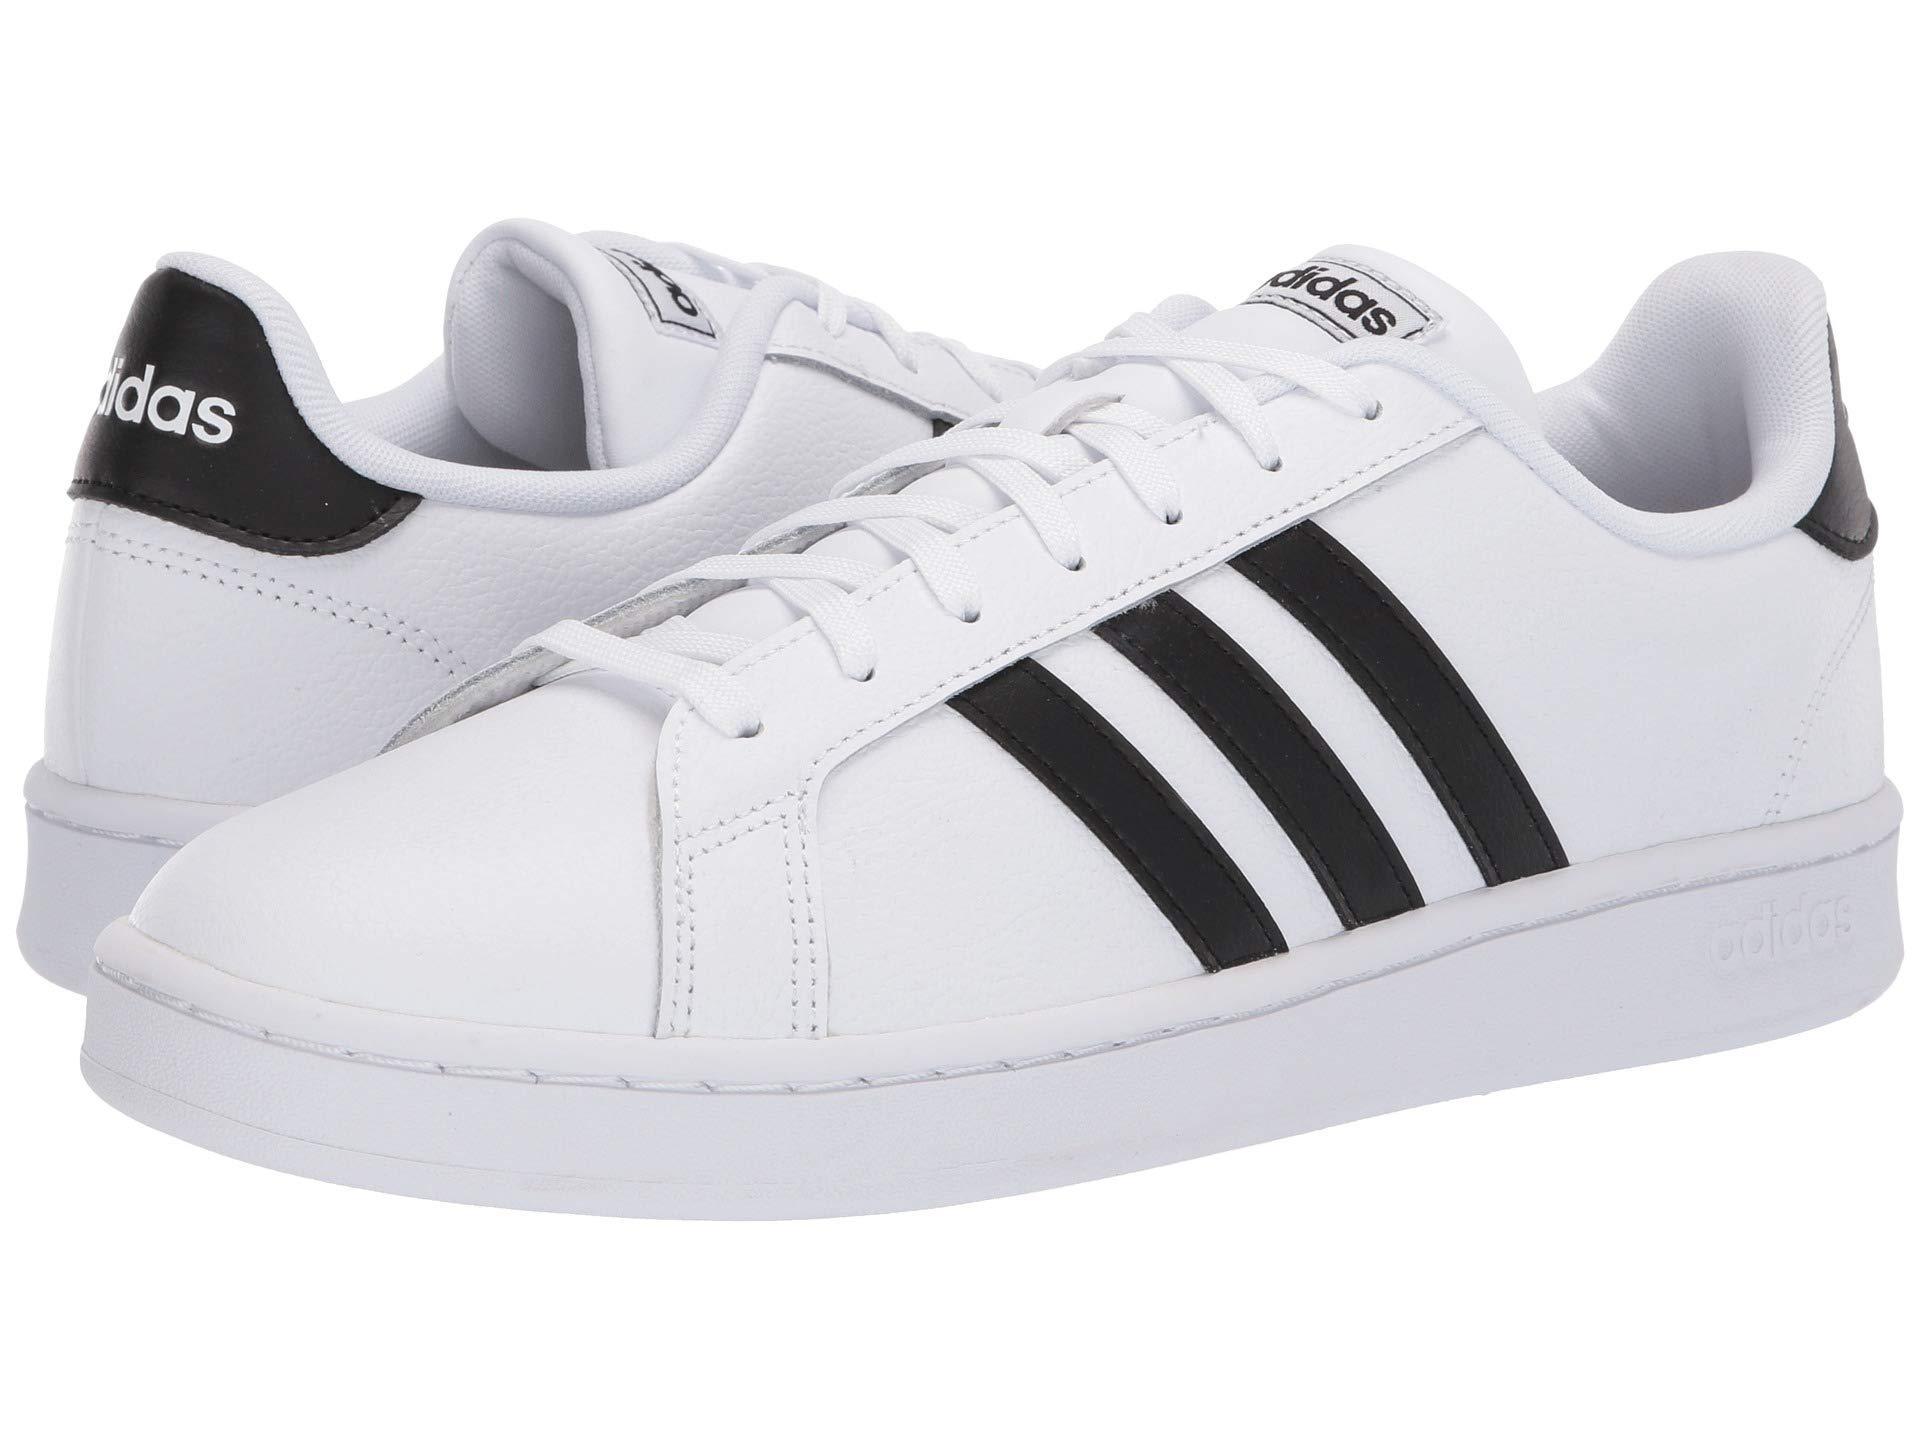 94e67650d Lyst - adidas Grand Court in White for Men